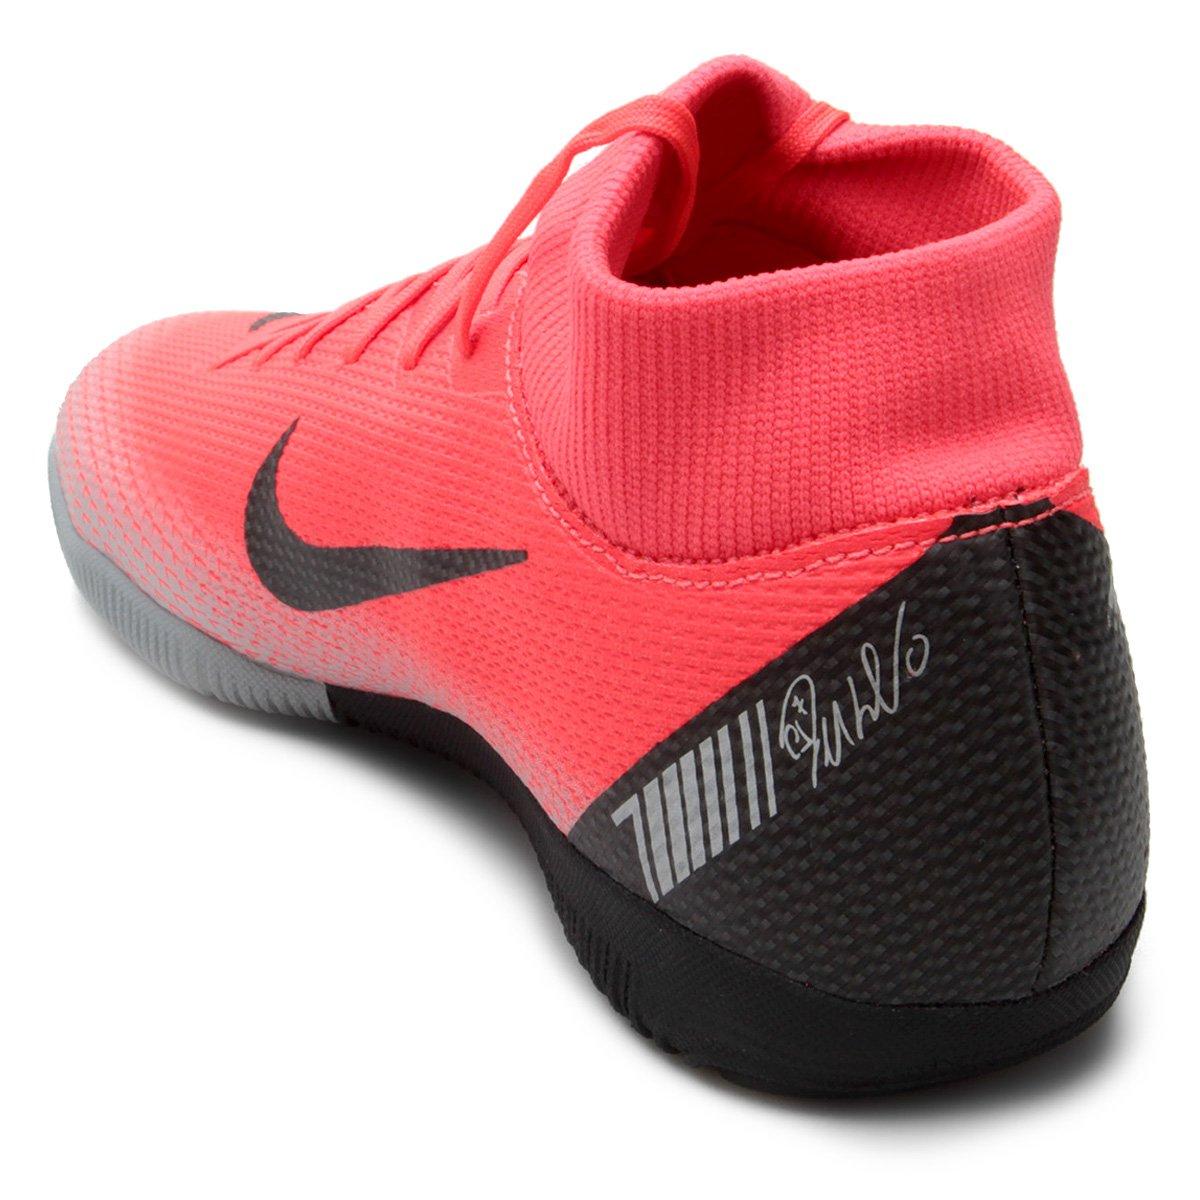 Chuteira Futsal Nike Mercurial Superfly 6 Academy CR7 IC - Vermelho ... 3c0c15348f696